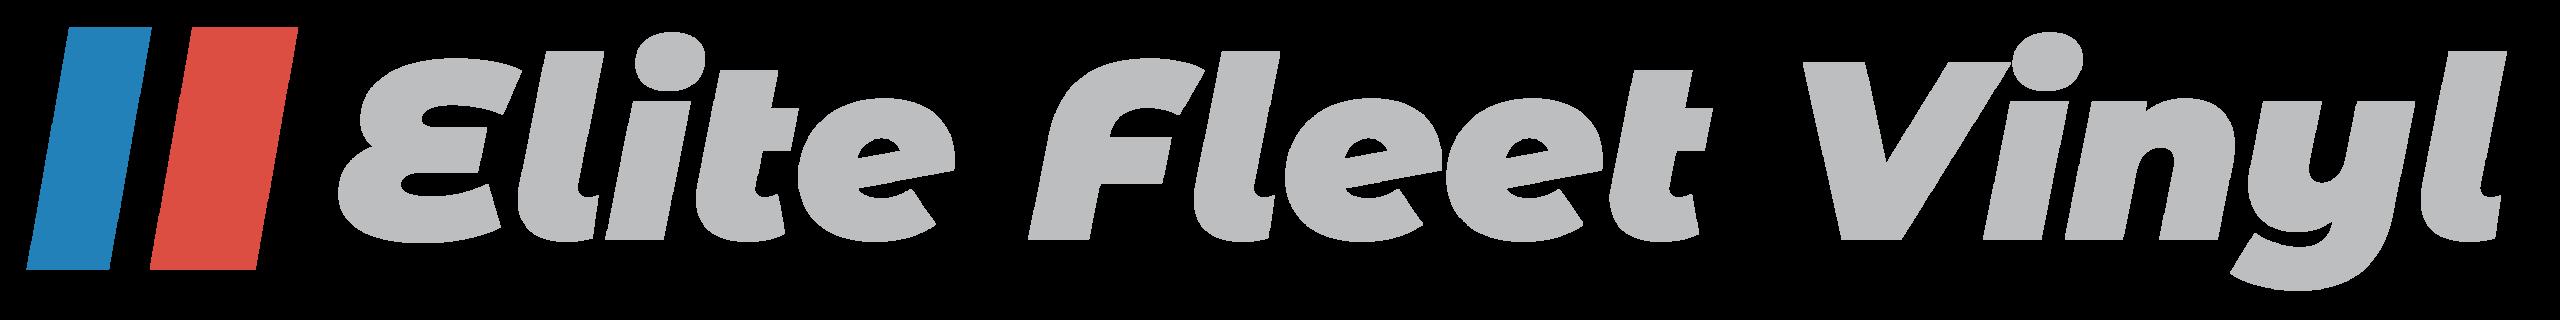 Elite Fleet Vinyl